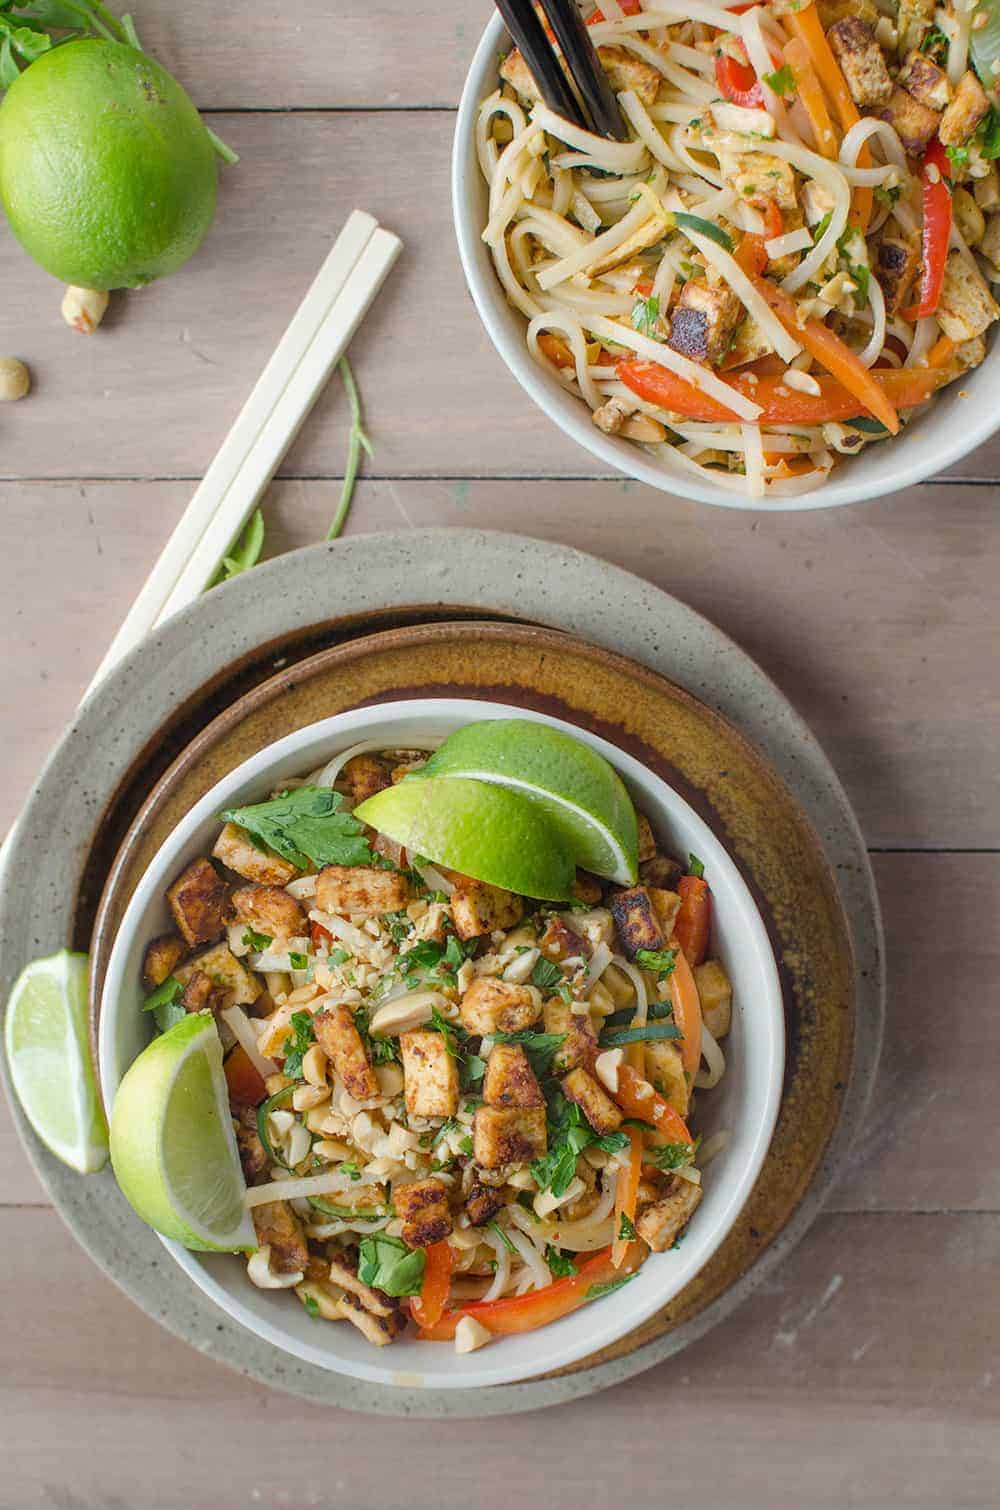 Spicy Vegan Pad Thai! Spicy pad thai with Sriracha tofu crumbles. Vegan and Gluten Free | www.delishknowledge.com